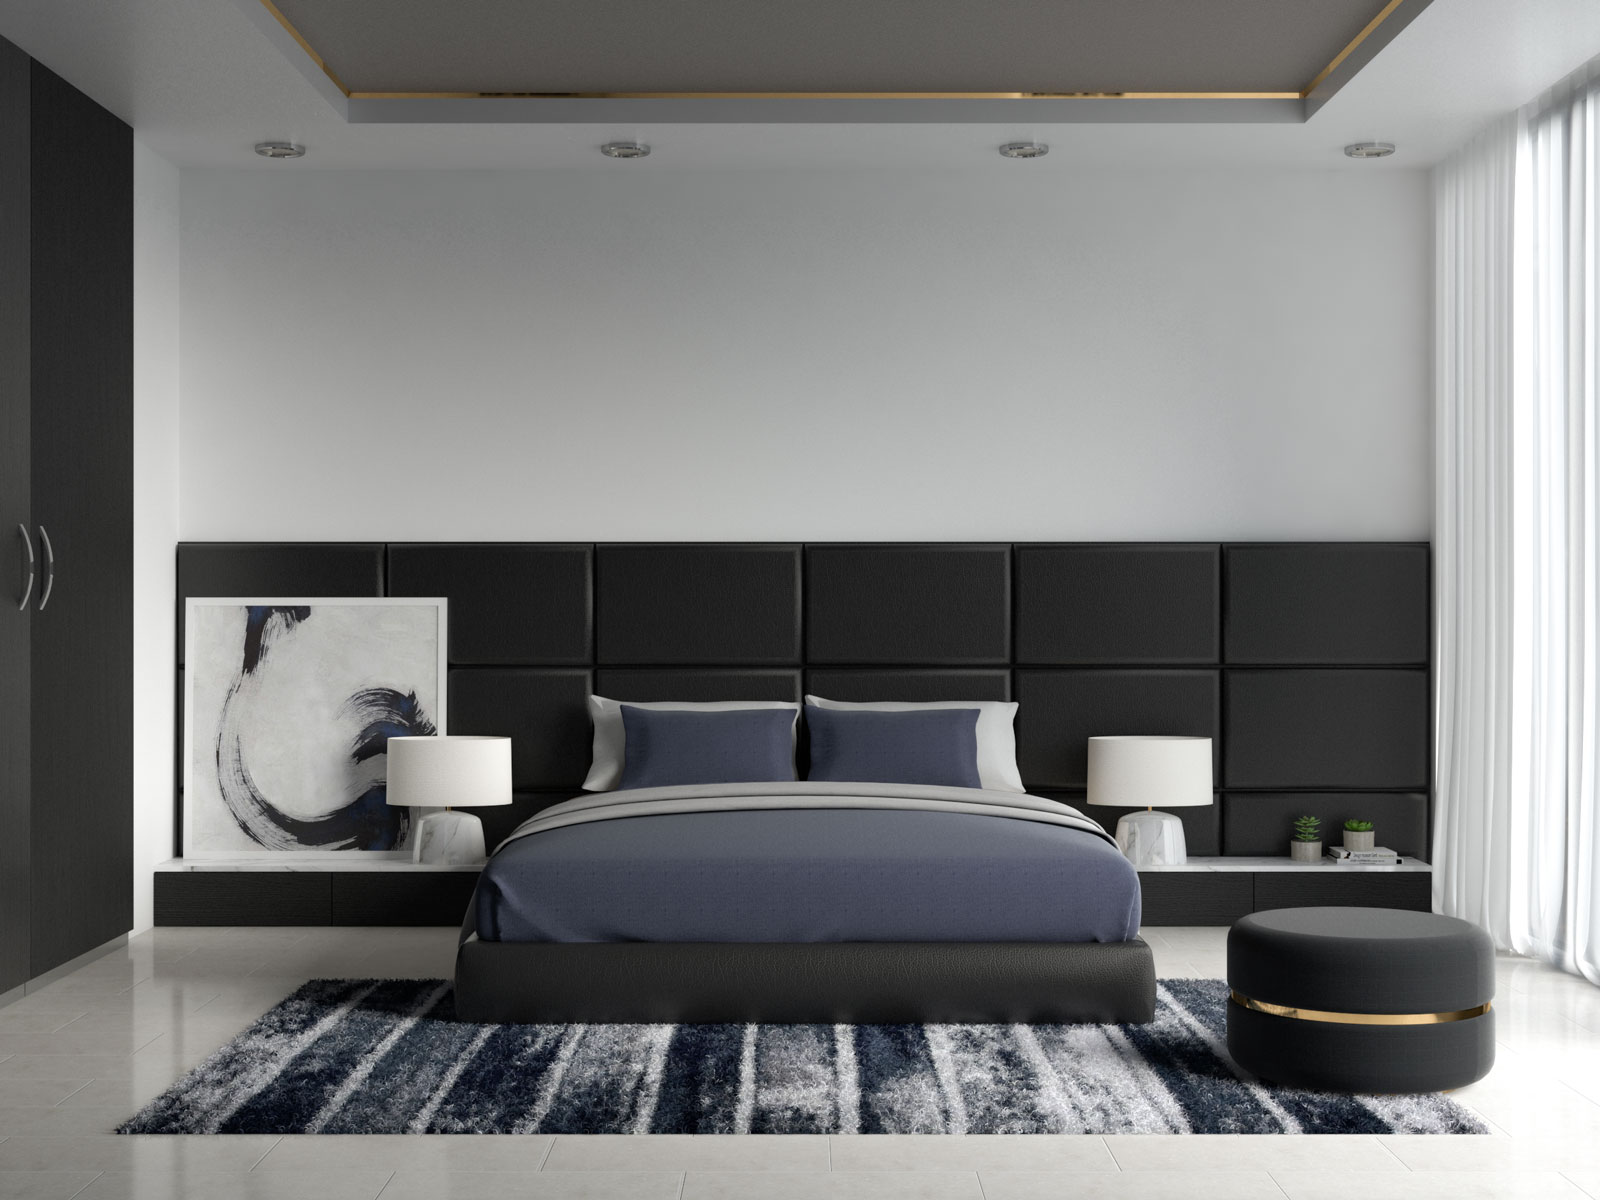 Navy bedding inside black bedroom